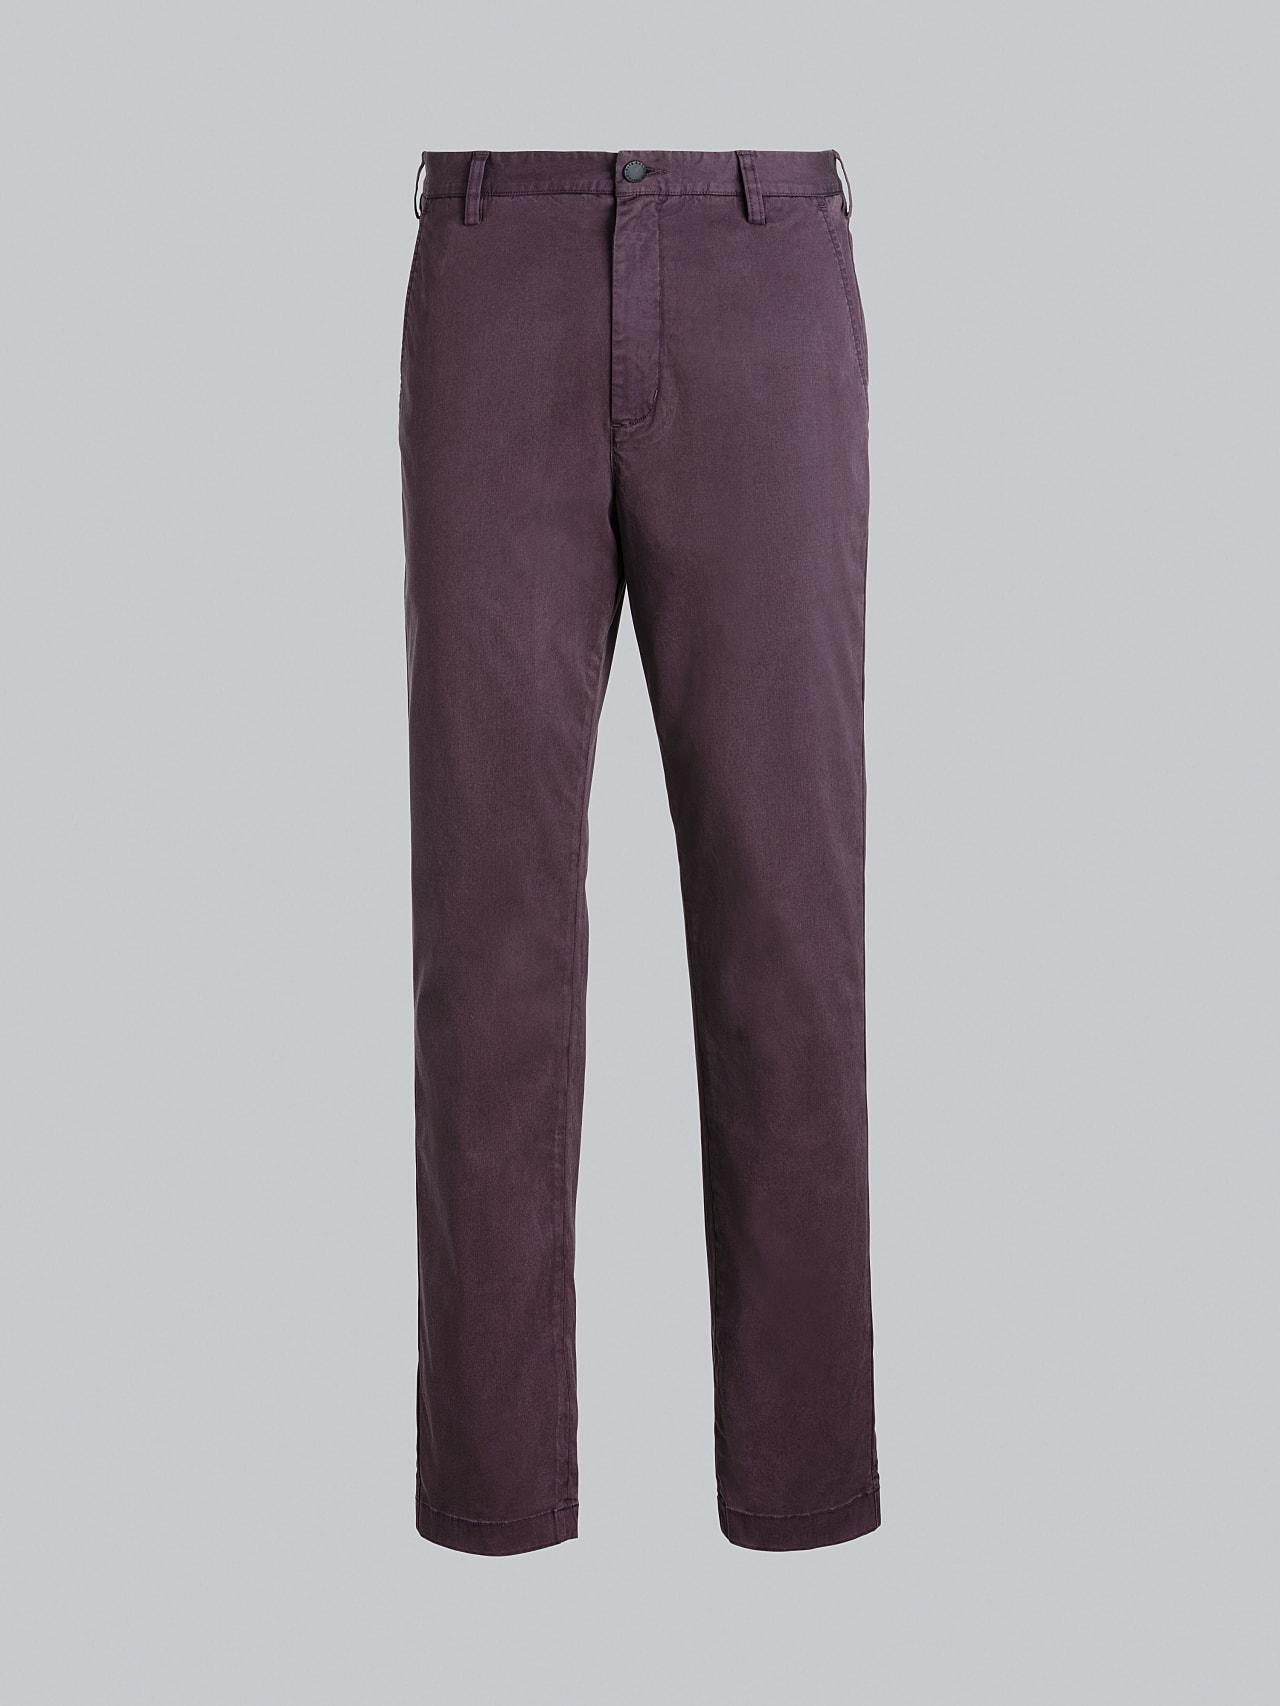 PARO V5.Y5.02 Straight Cut Cotton Chino Burgundy Back Alpha Tauri